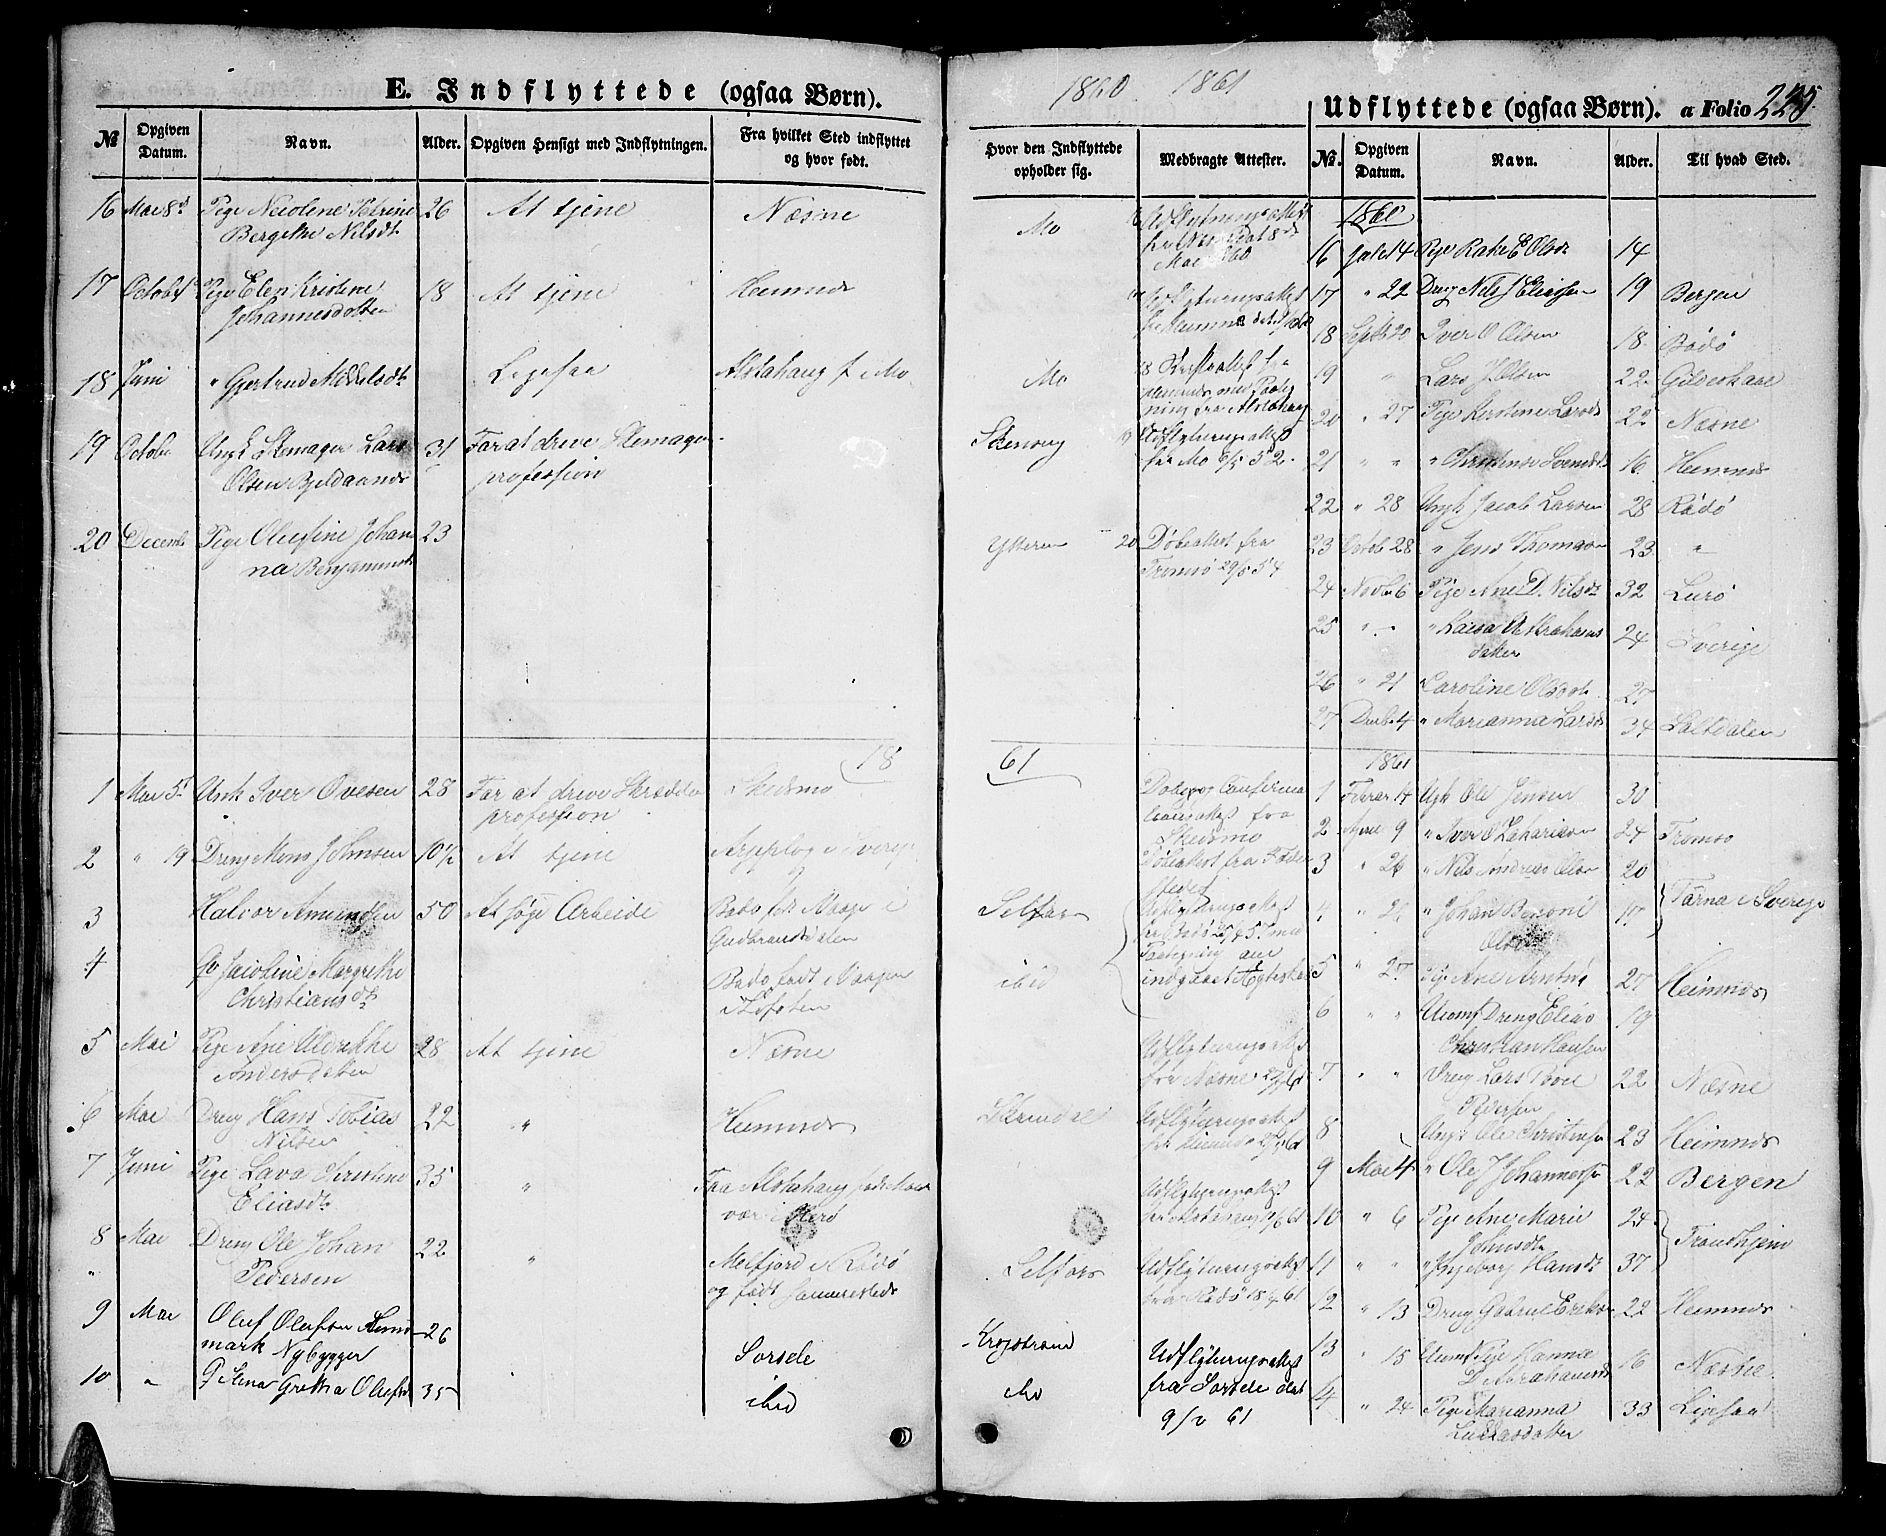 SAT, Ministerialprotokoller, klokkerbøker og fødselsregistre - Nordland, 827/L0414: Klokkerbok nr. 827C03, 1853-1865, s. 225